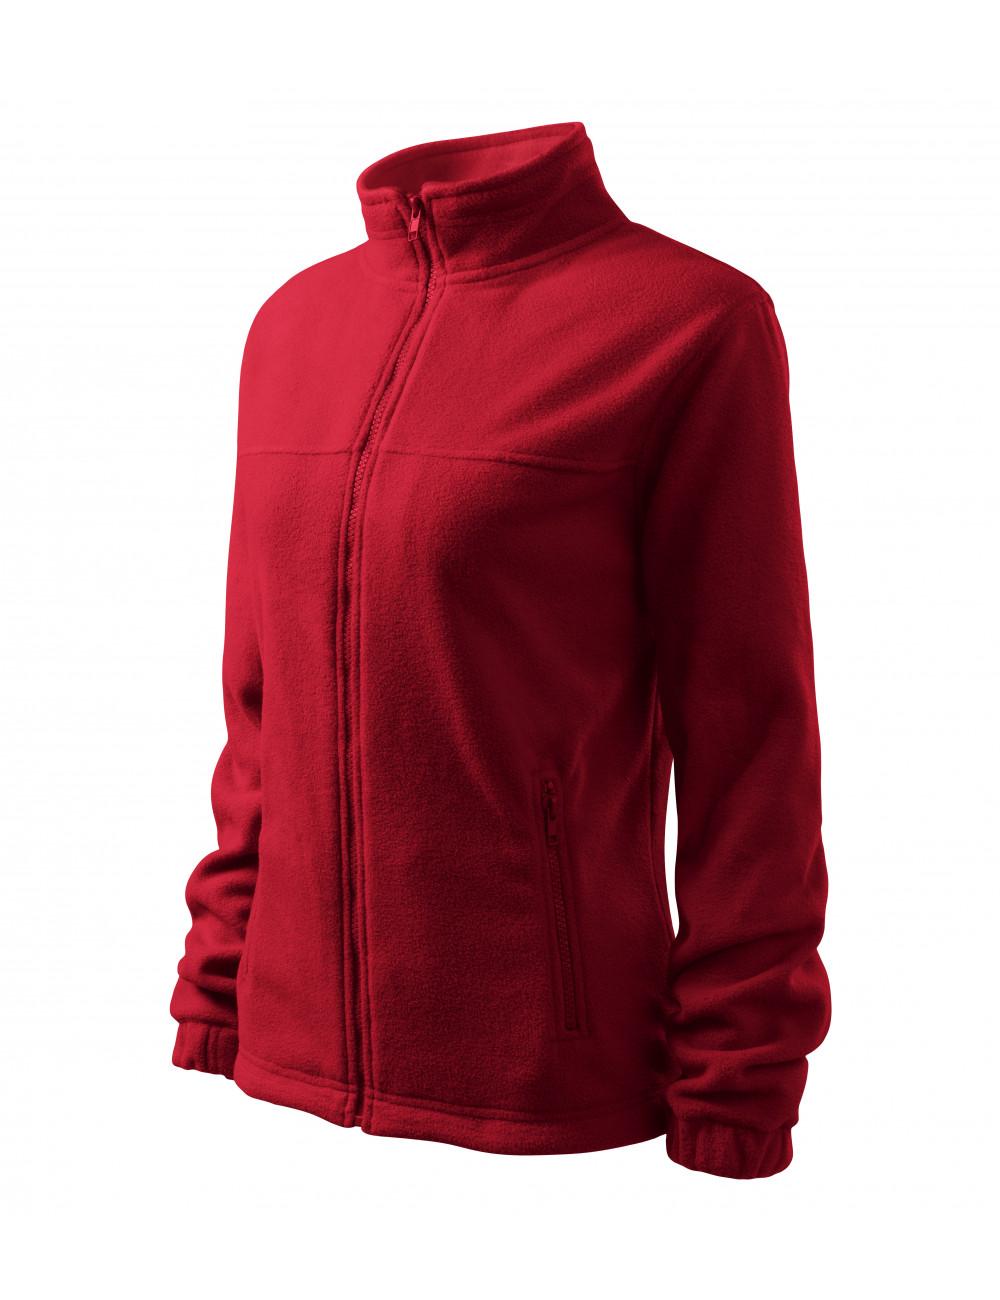 Adler RIMECK Polar damski Jacket 504 marlboro czerwony